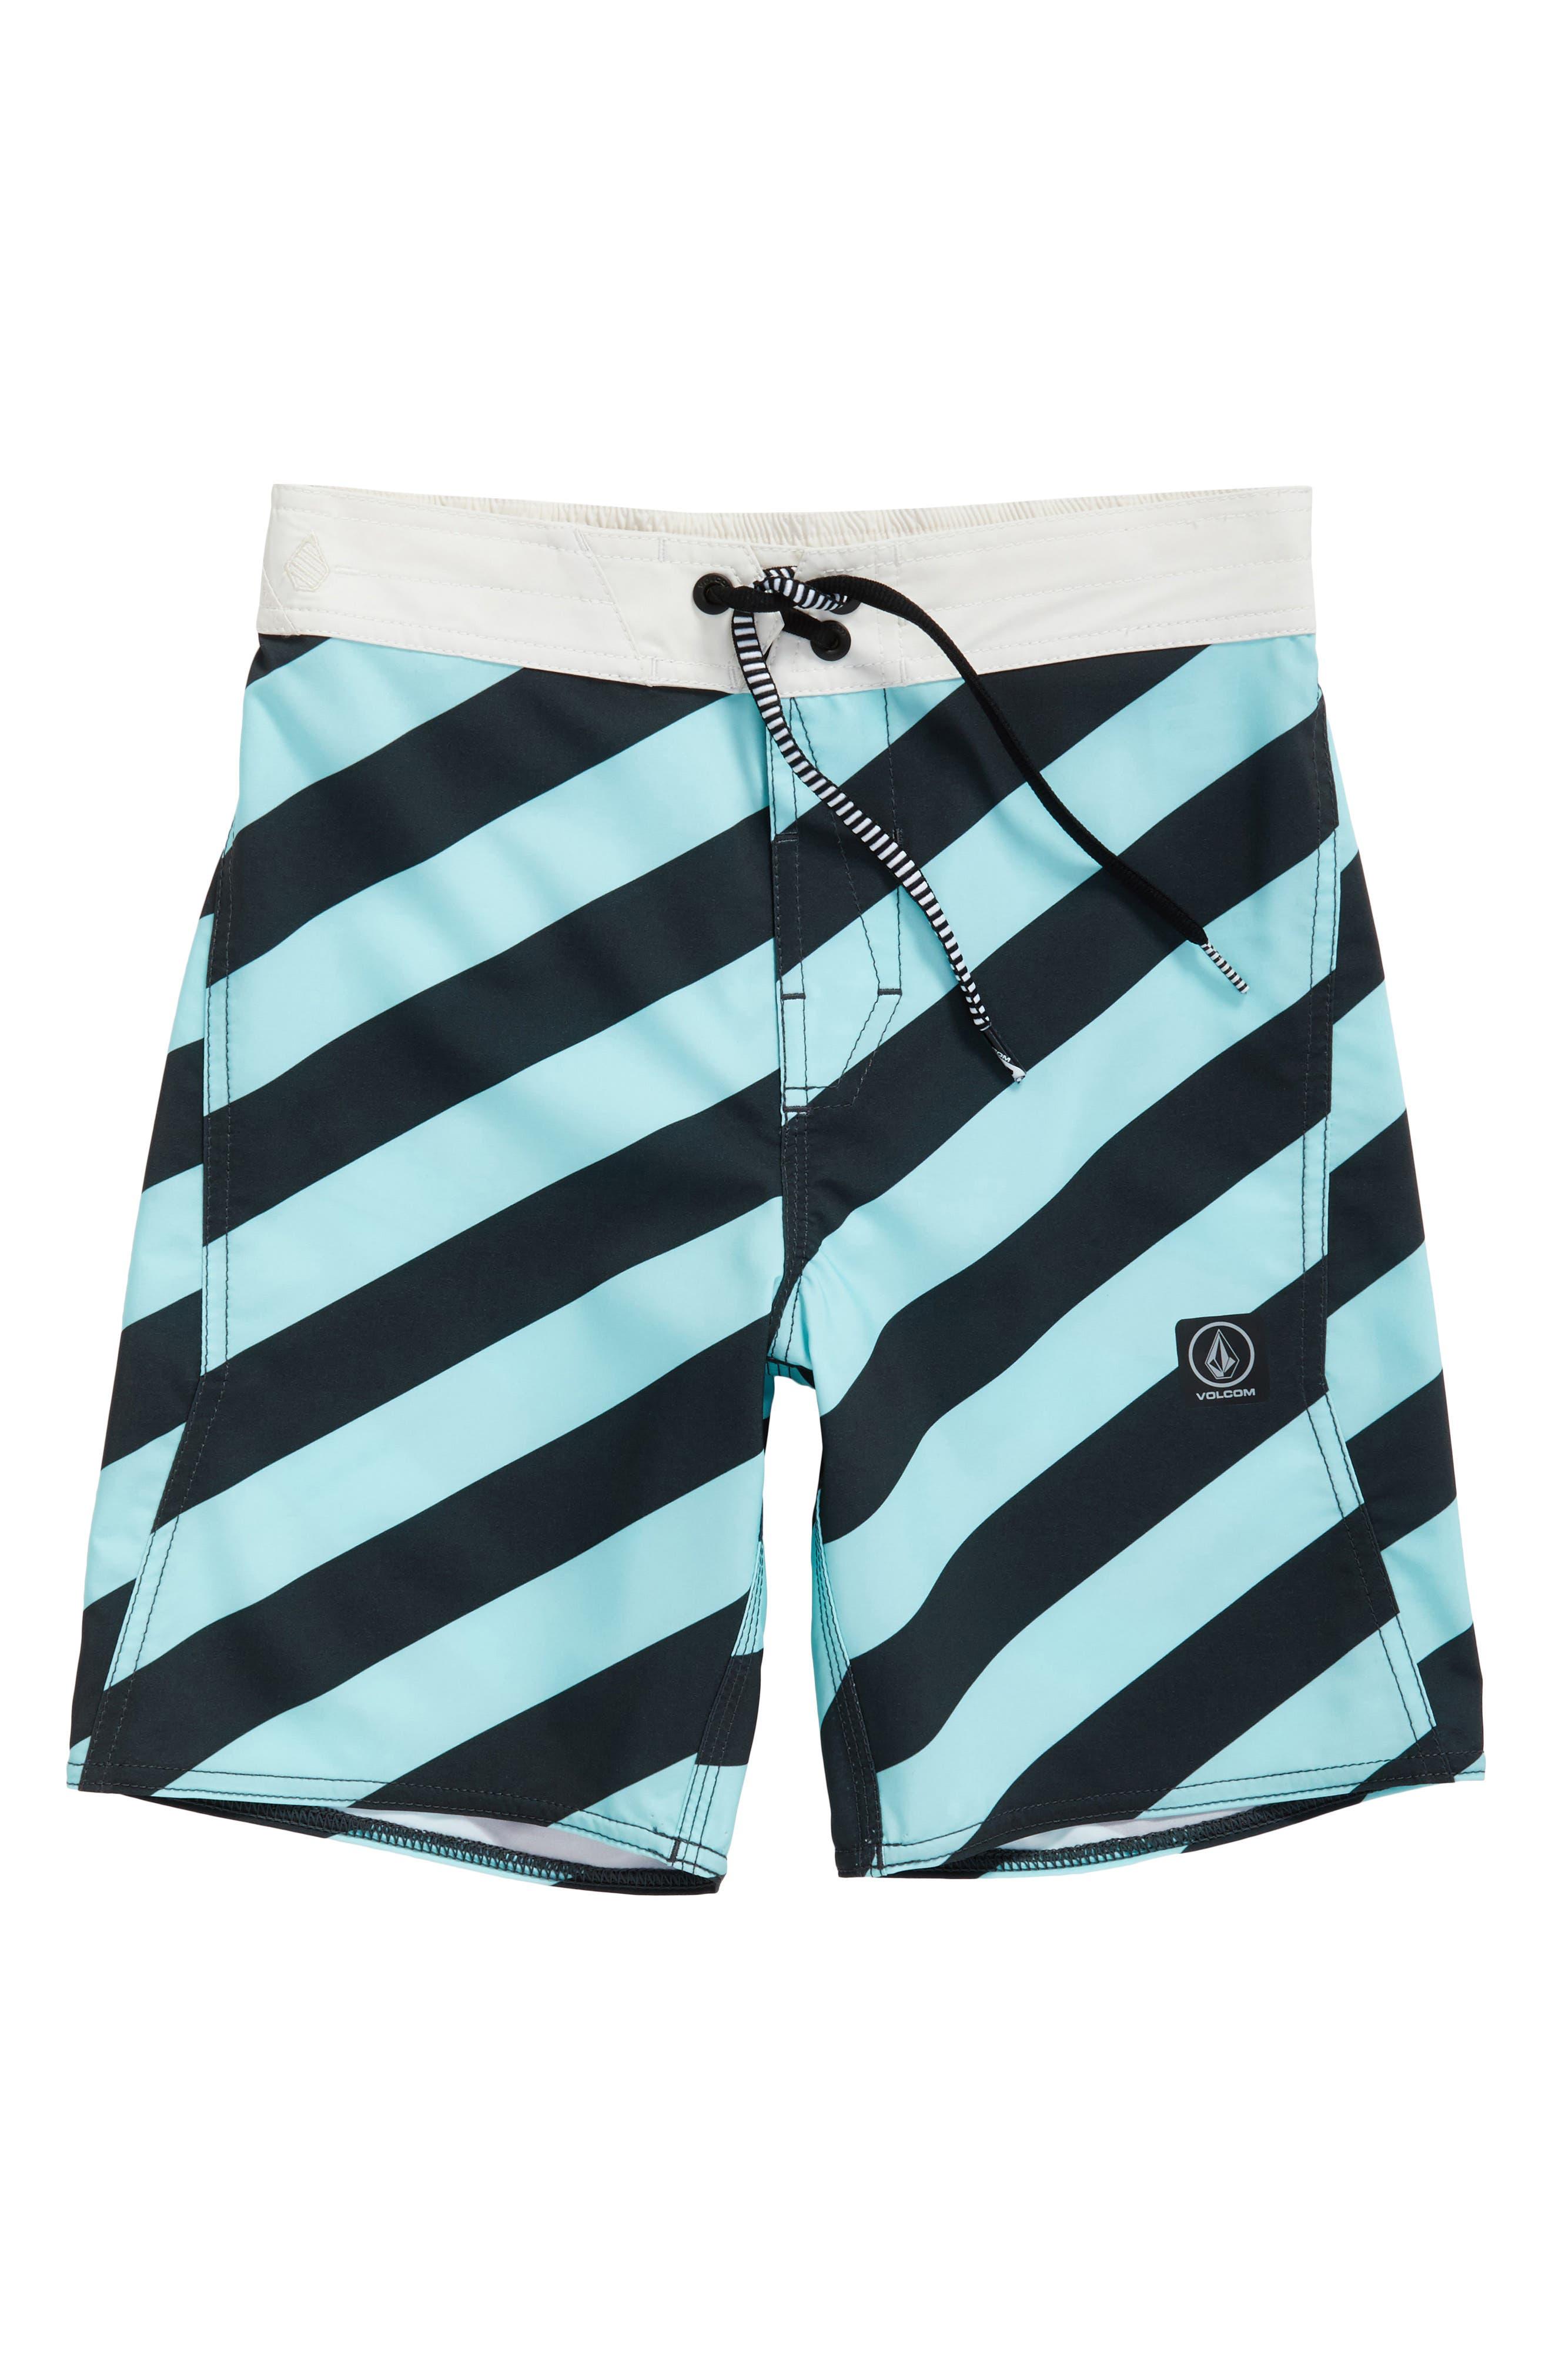 Alternate Image 1 Selected - Volcom Stripey Swim Trunks (Big Boys)